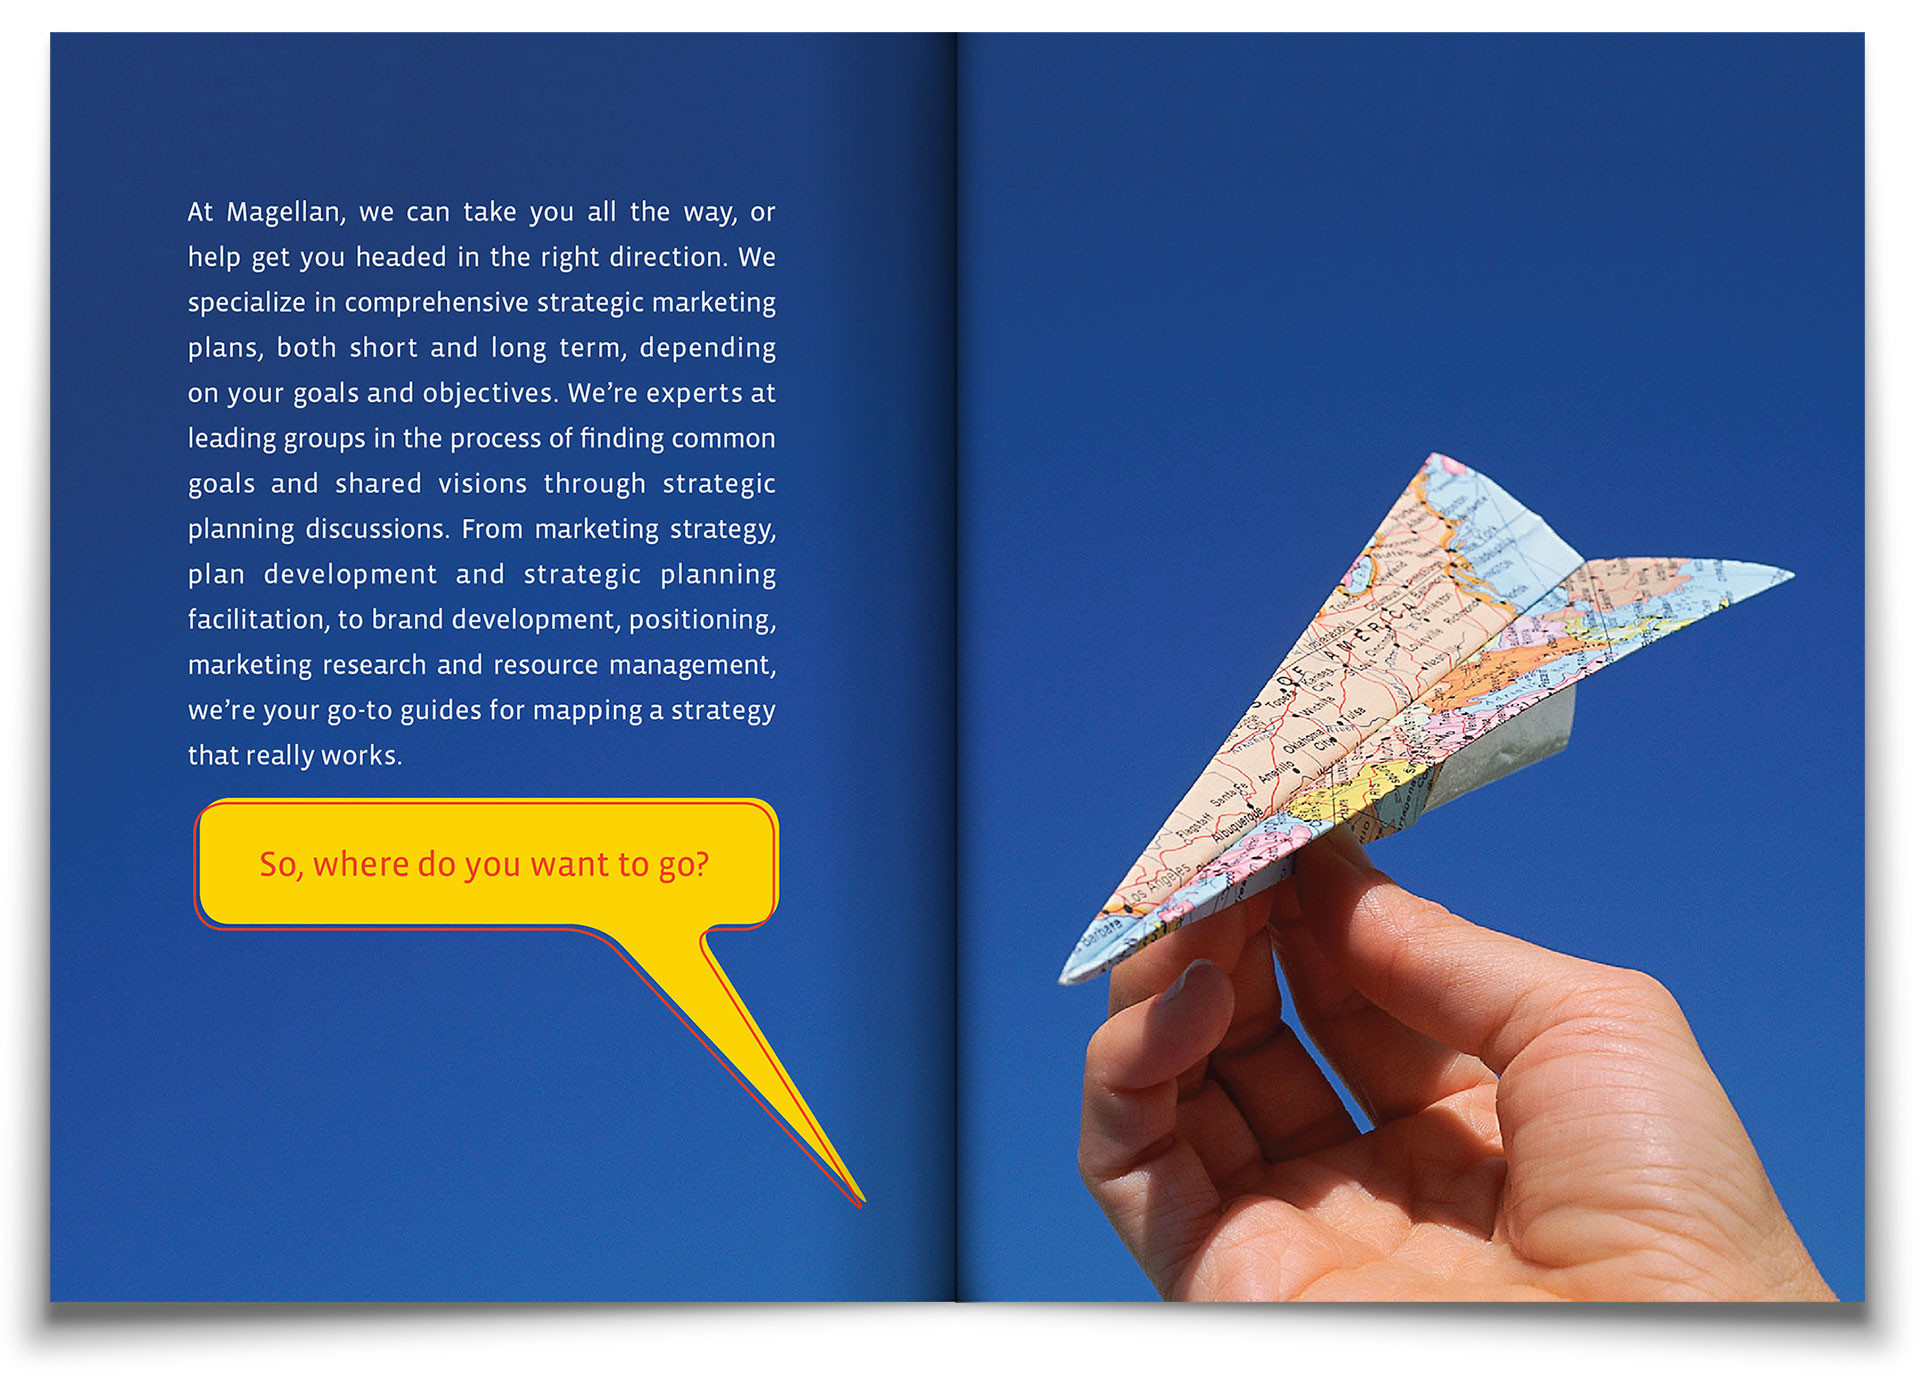 magellan_brochure_3.jpg